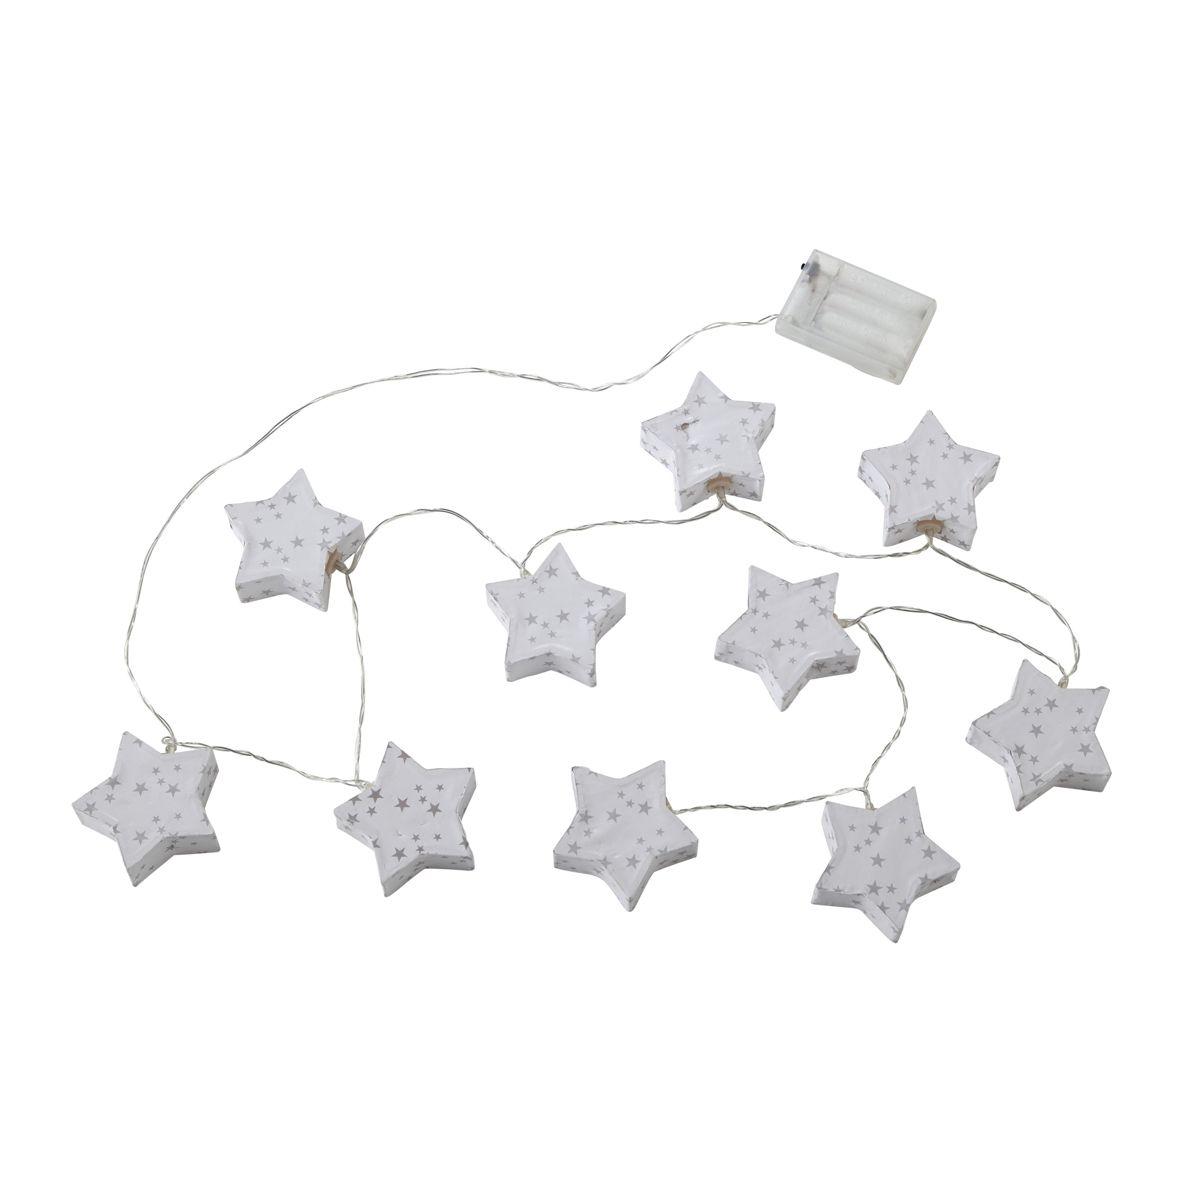 guirlande lumineuse toiles moonlight 11 99 maisons du monde baby room pinterest light. Black Bedroom Furniture Sets. Home Design Ideas